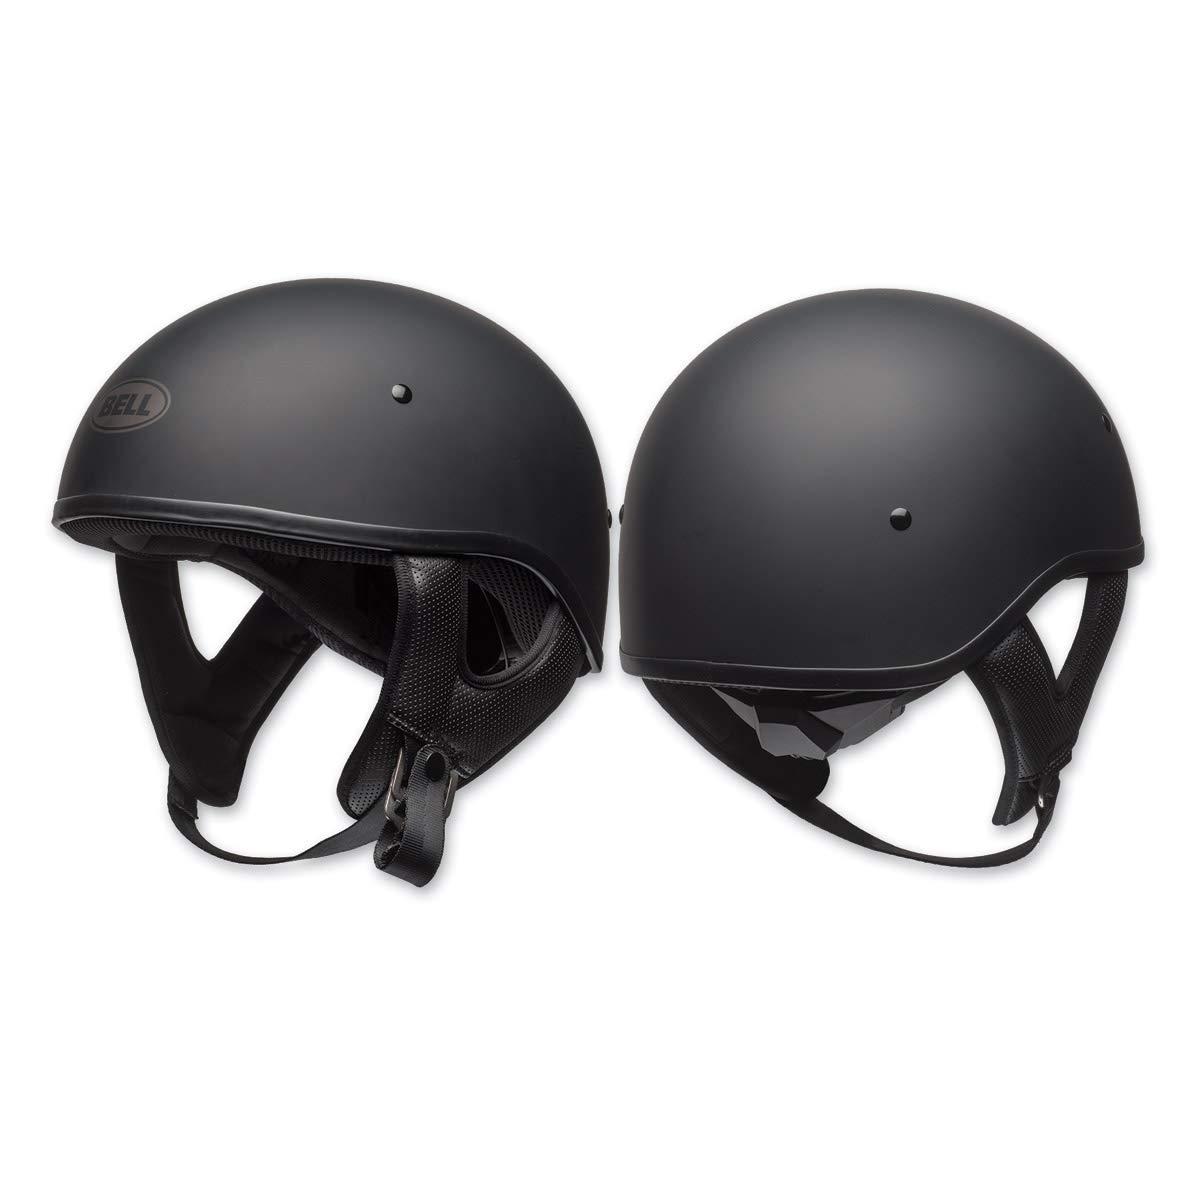 Bell Pit Boss ''Sport'' Unisex-Adult Half Street Helmet (Solid Matte Black, Large) (D.O.T.-Certified)